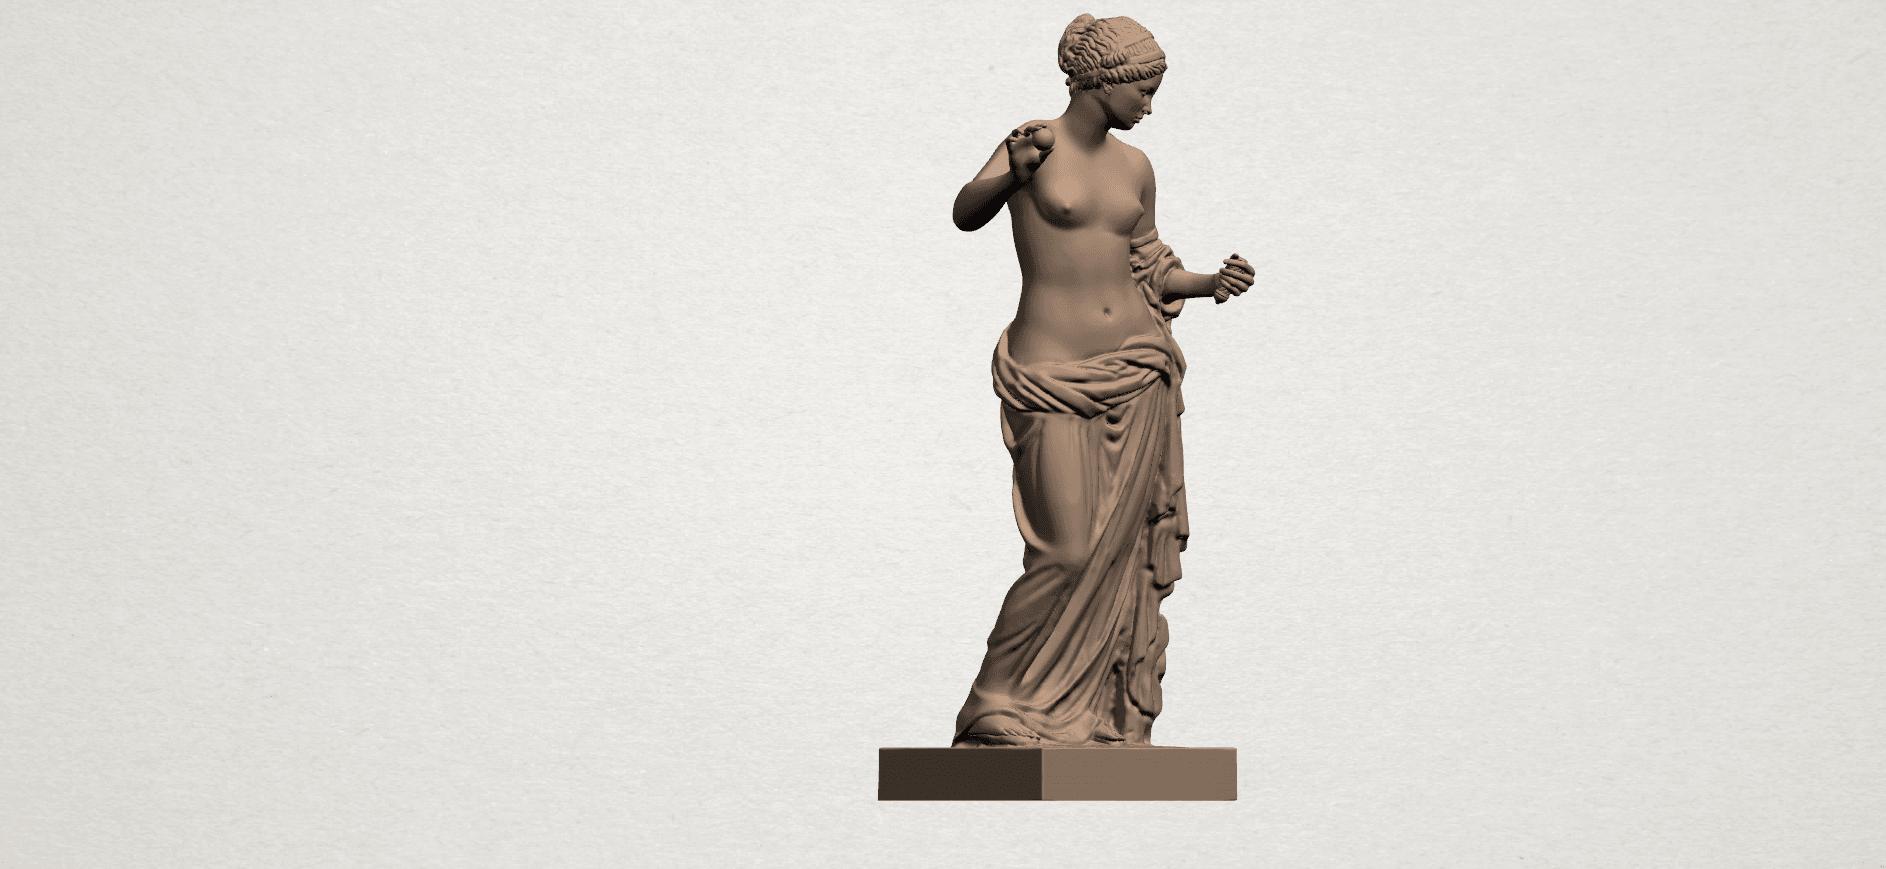 Naked Girl (xiv) A08.png Download free STL file Naked Girl 14 • 3D printer design, GeorgesNikkei